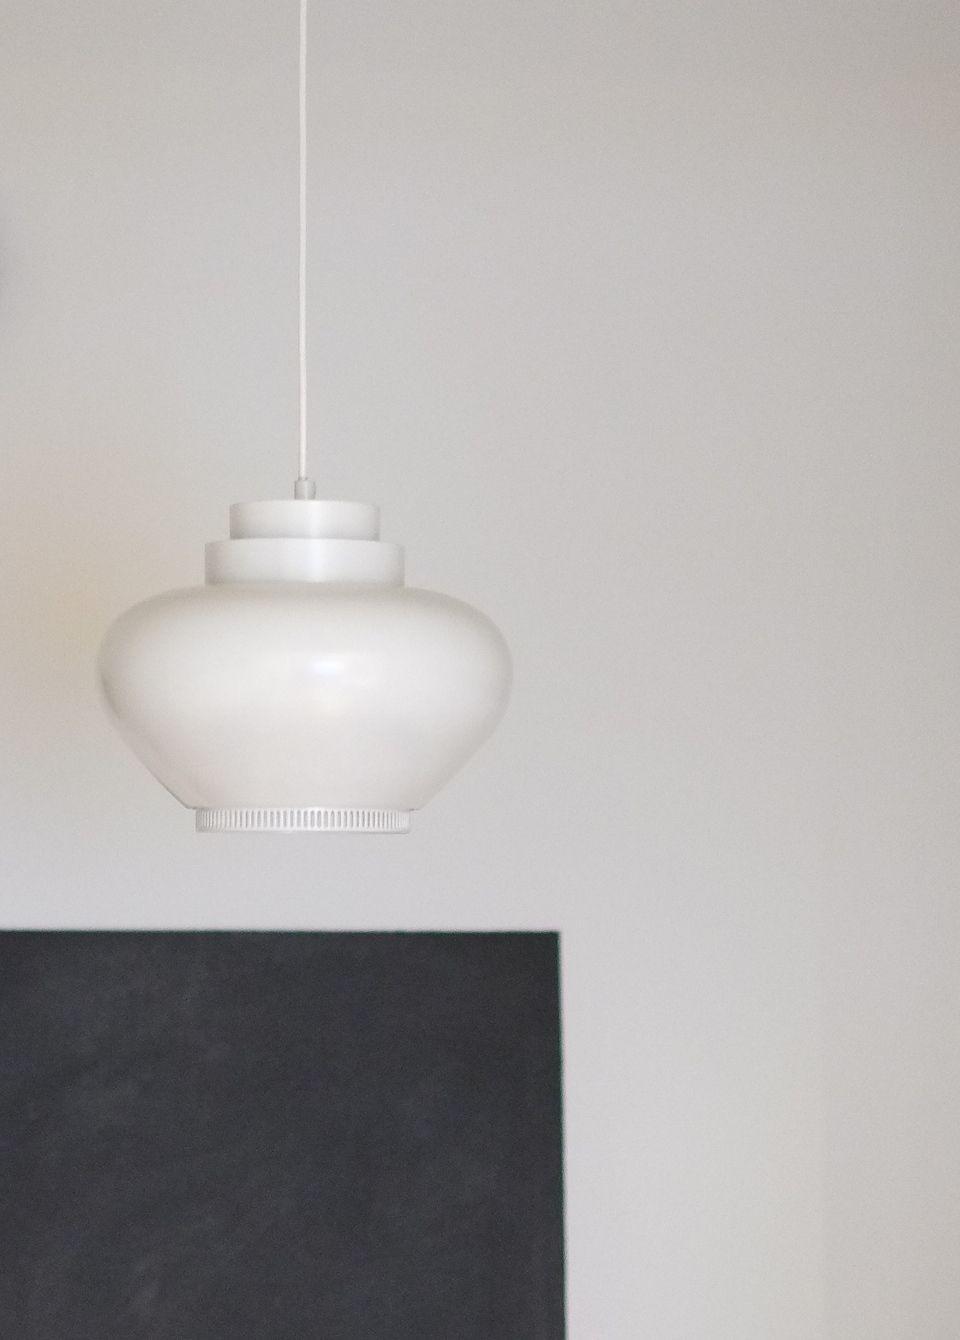 Artek products lighting pendant light a338 - Artek A333 Valaisin Pendant Lamp